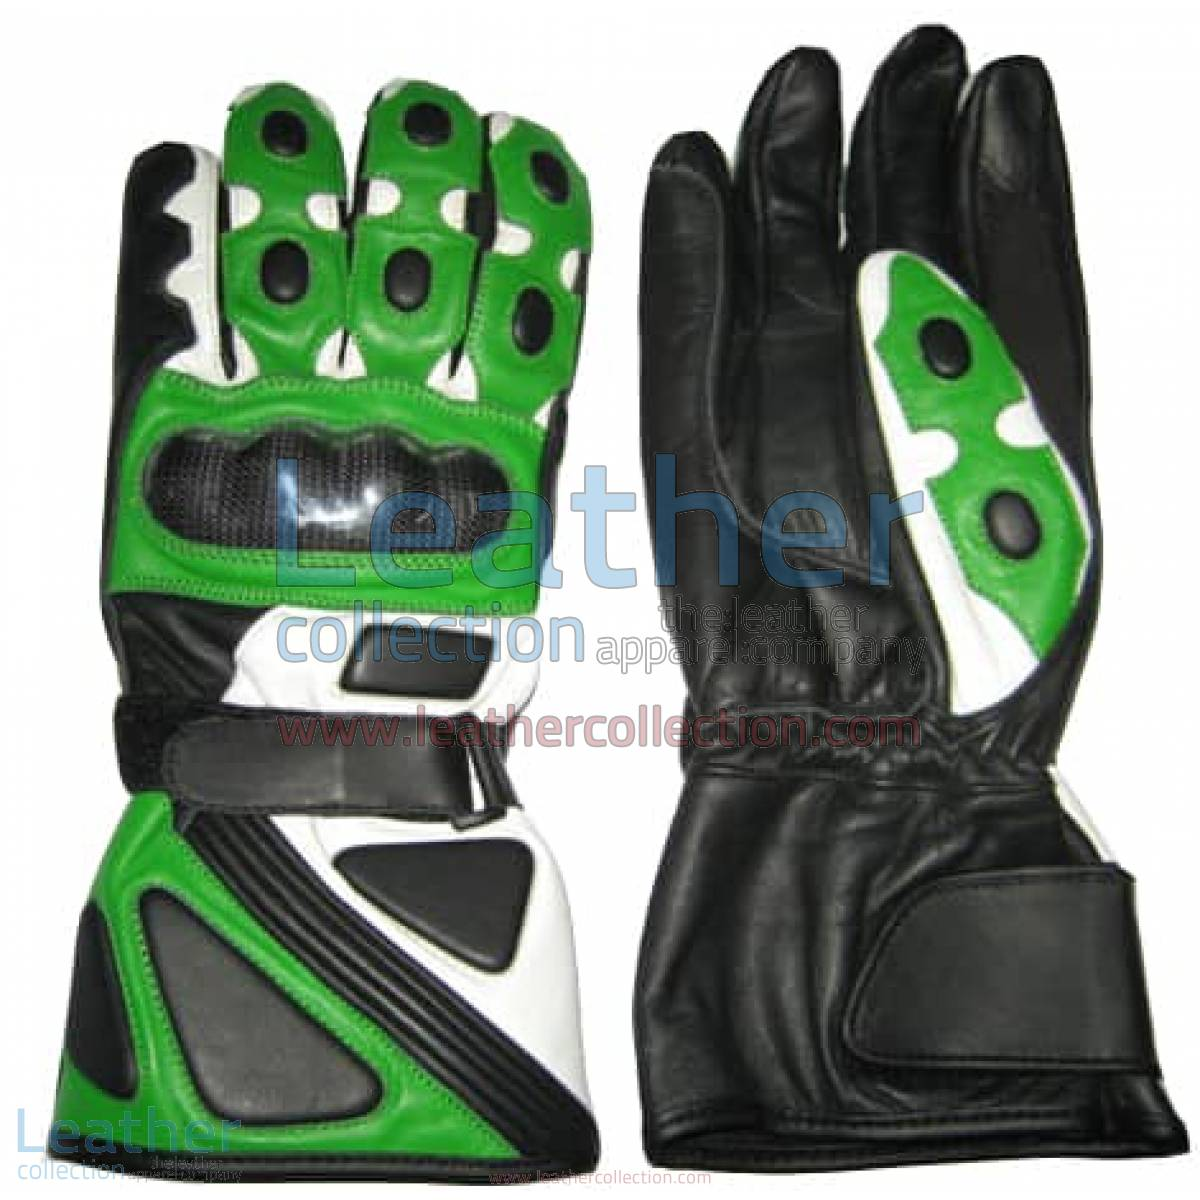 Bravo Green Motorcycle Race Gloves